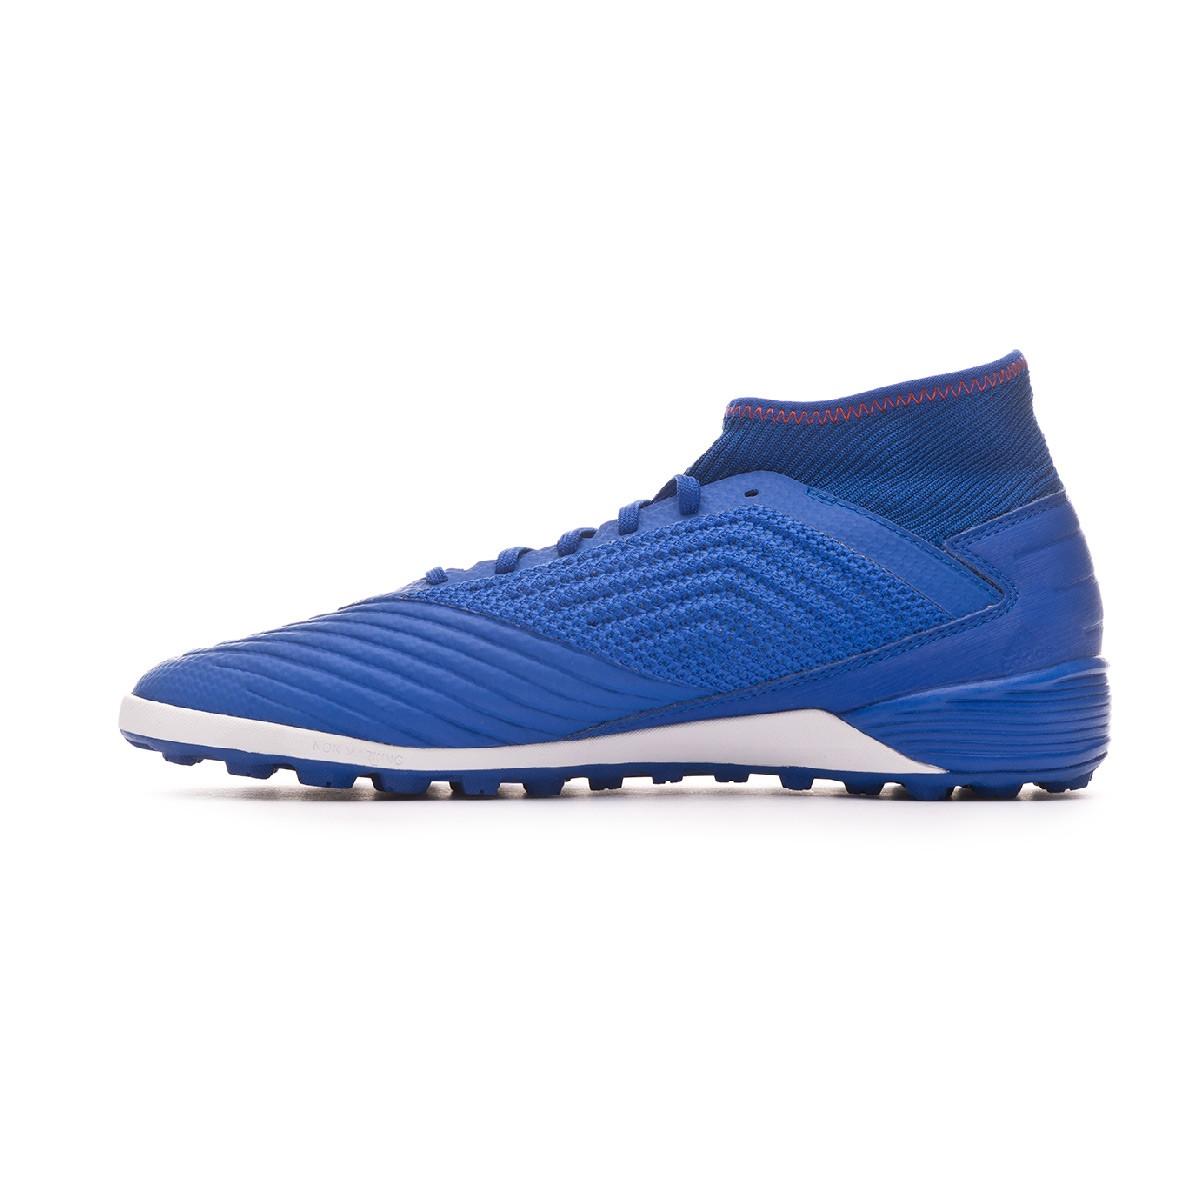 a7d397c20 Football Boot adidas Predator Tango 19.3 Turf Bold blue-Silver metallic-Active  red - Tienda de fútbol Fútbol Emotion